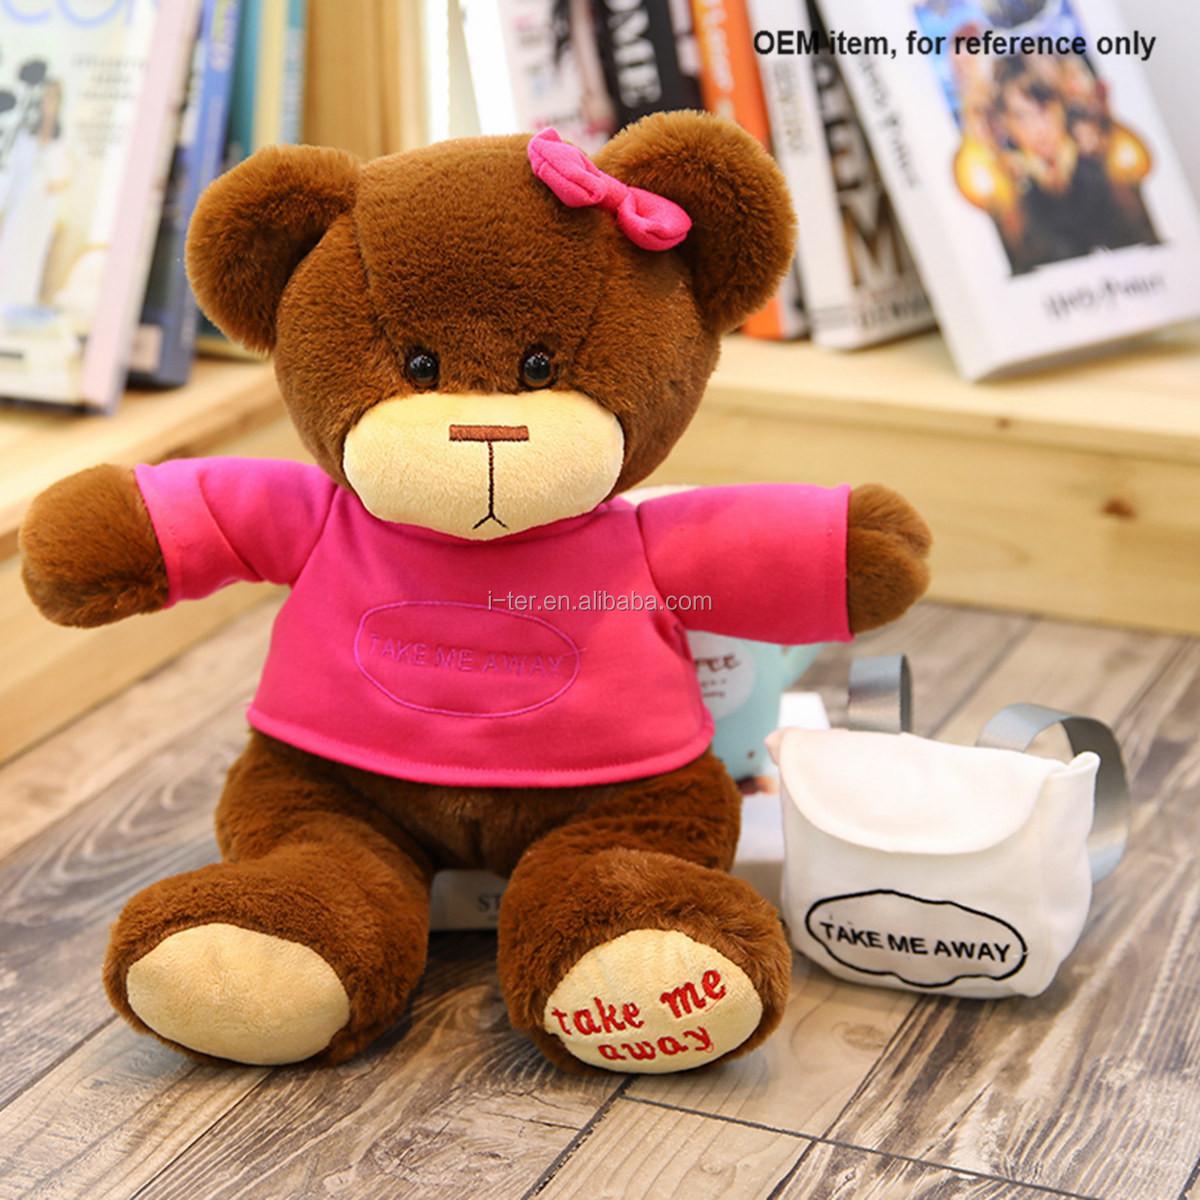 0d6005b9ad8 Oem China Factory Stuff T Shirt Teddy Bear Plush Kids Toys - Buy ...